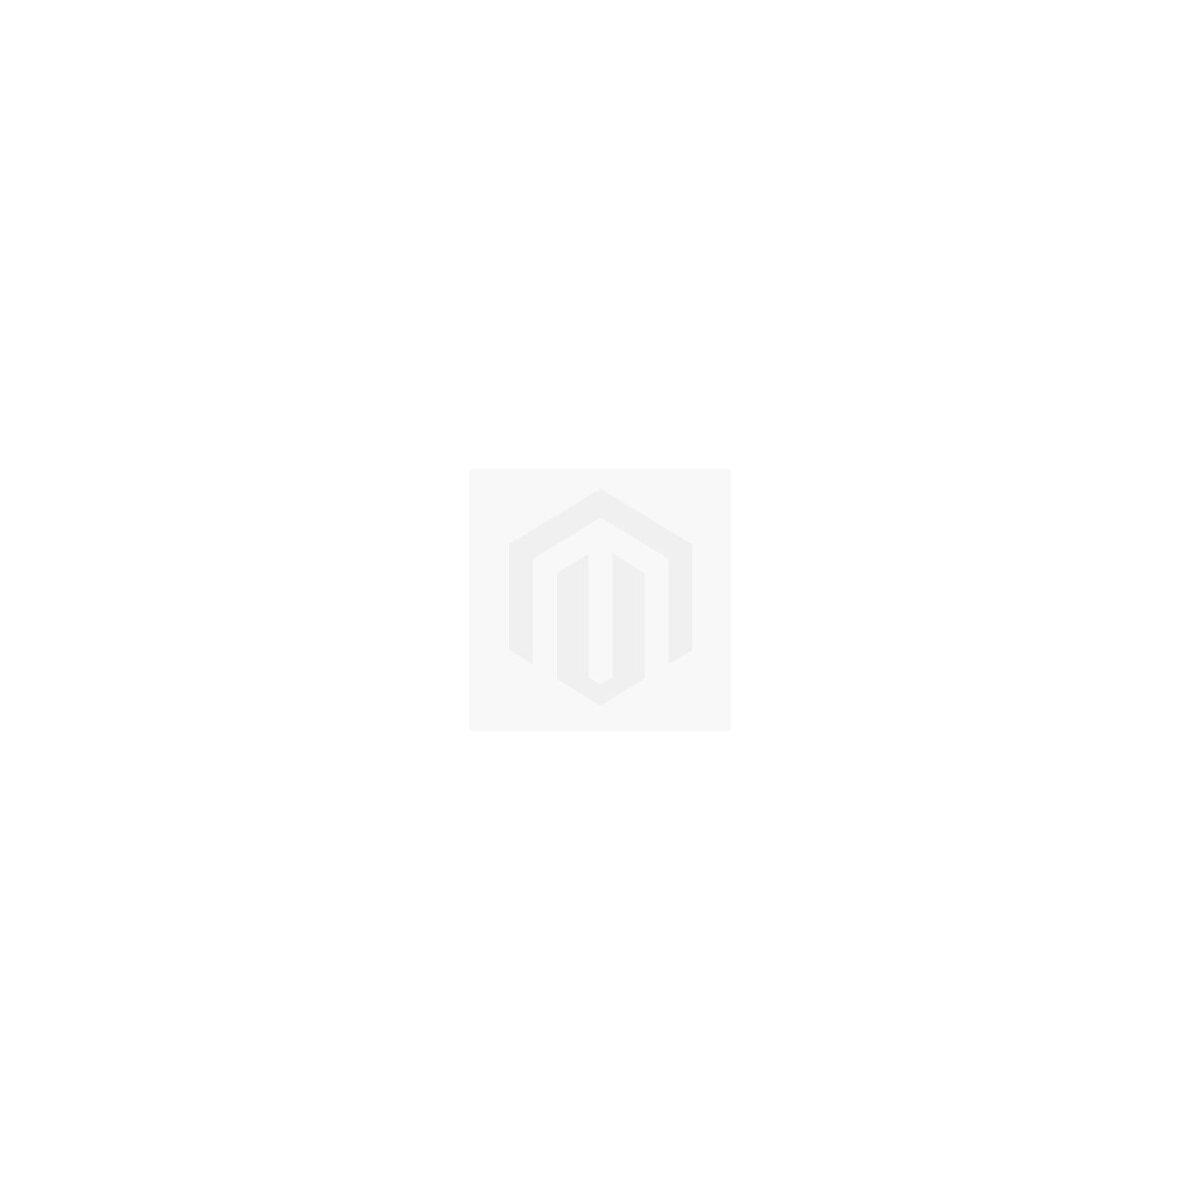 led fliesenprofil abschluss 200cm ledxess innovative. Black Bedroom Furniture Sets. Home Design Ideas